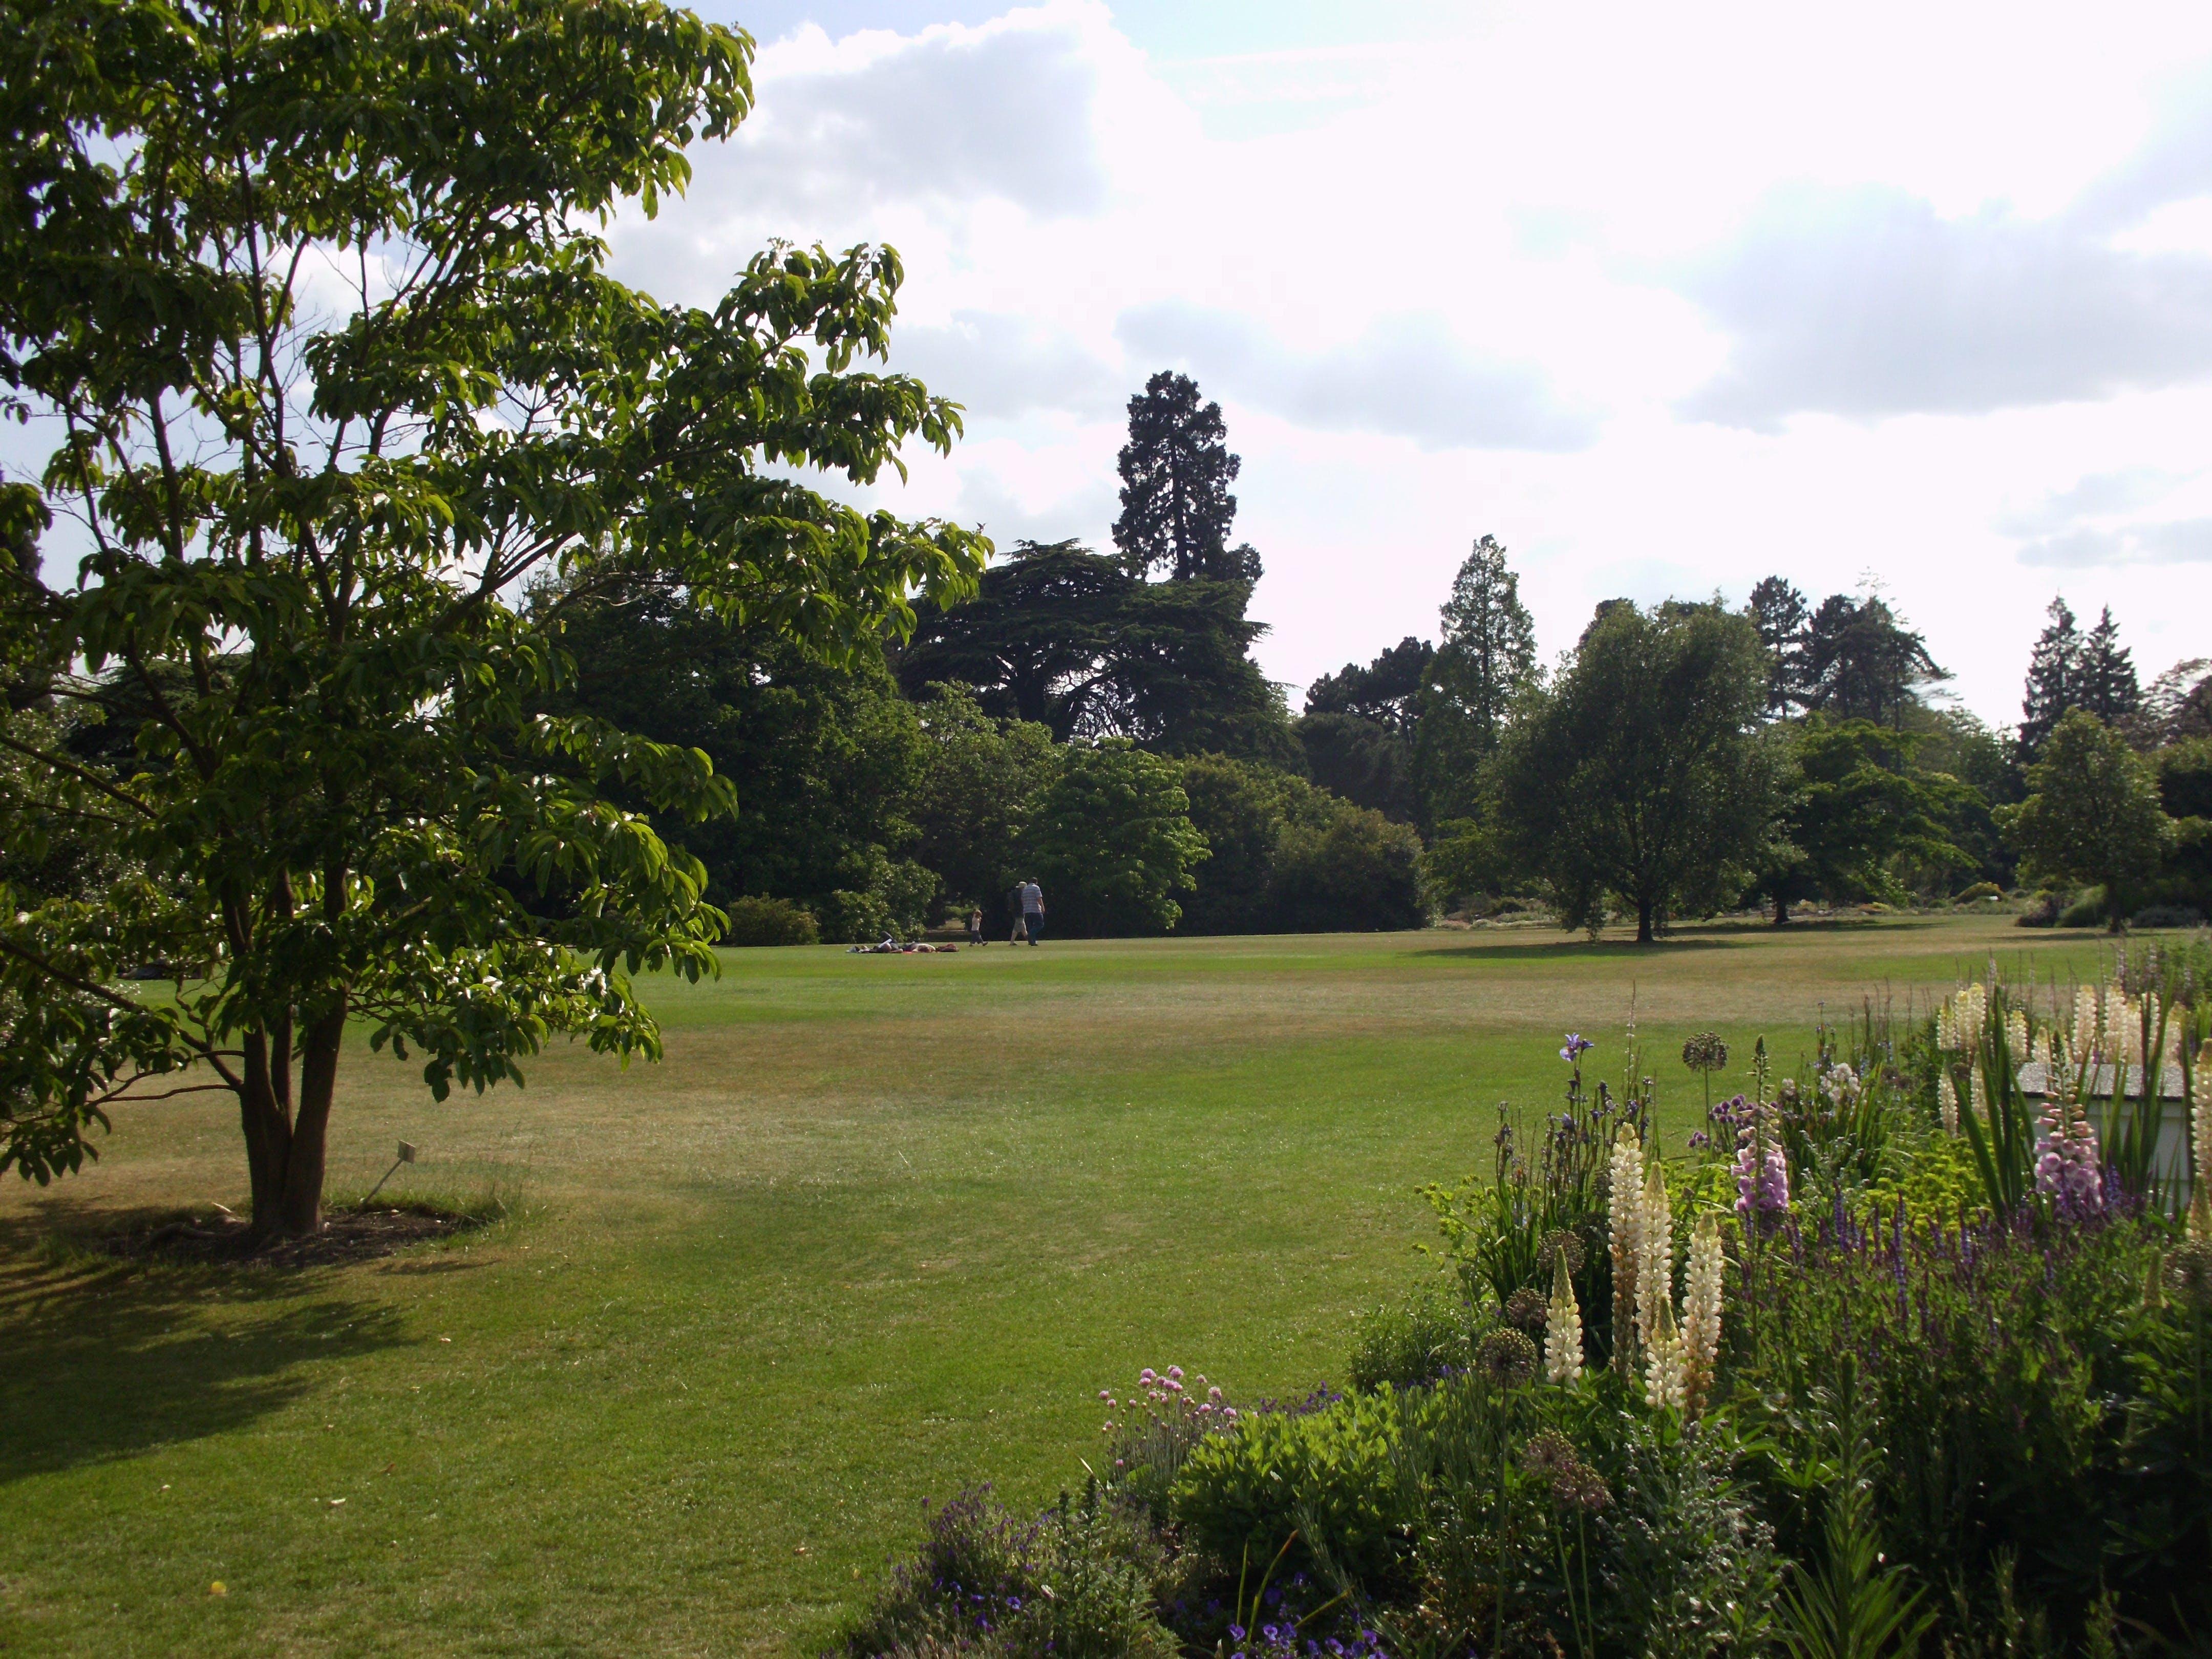 Free stock photo of Cambridge University Botanic Garden